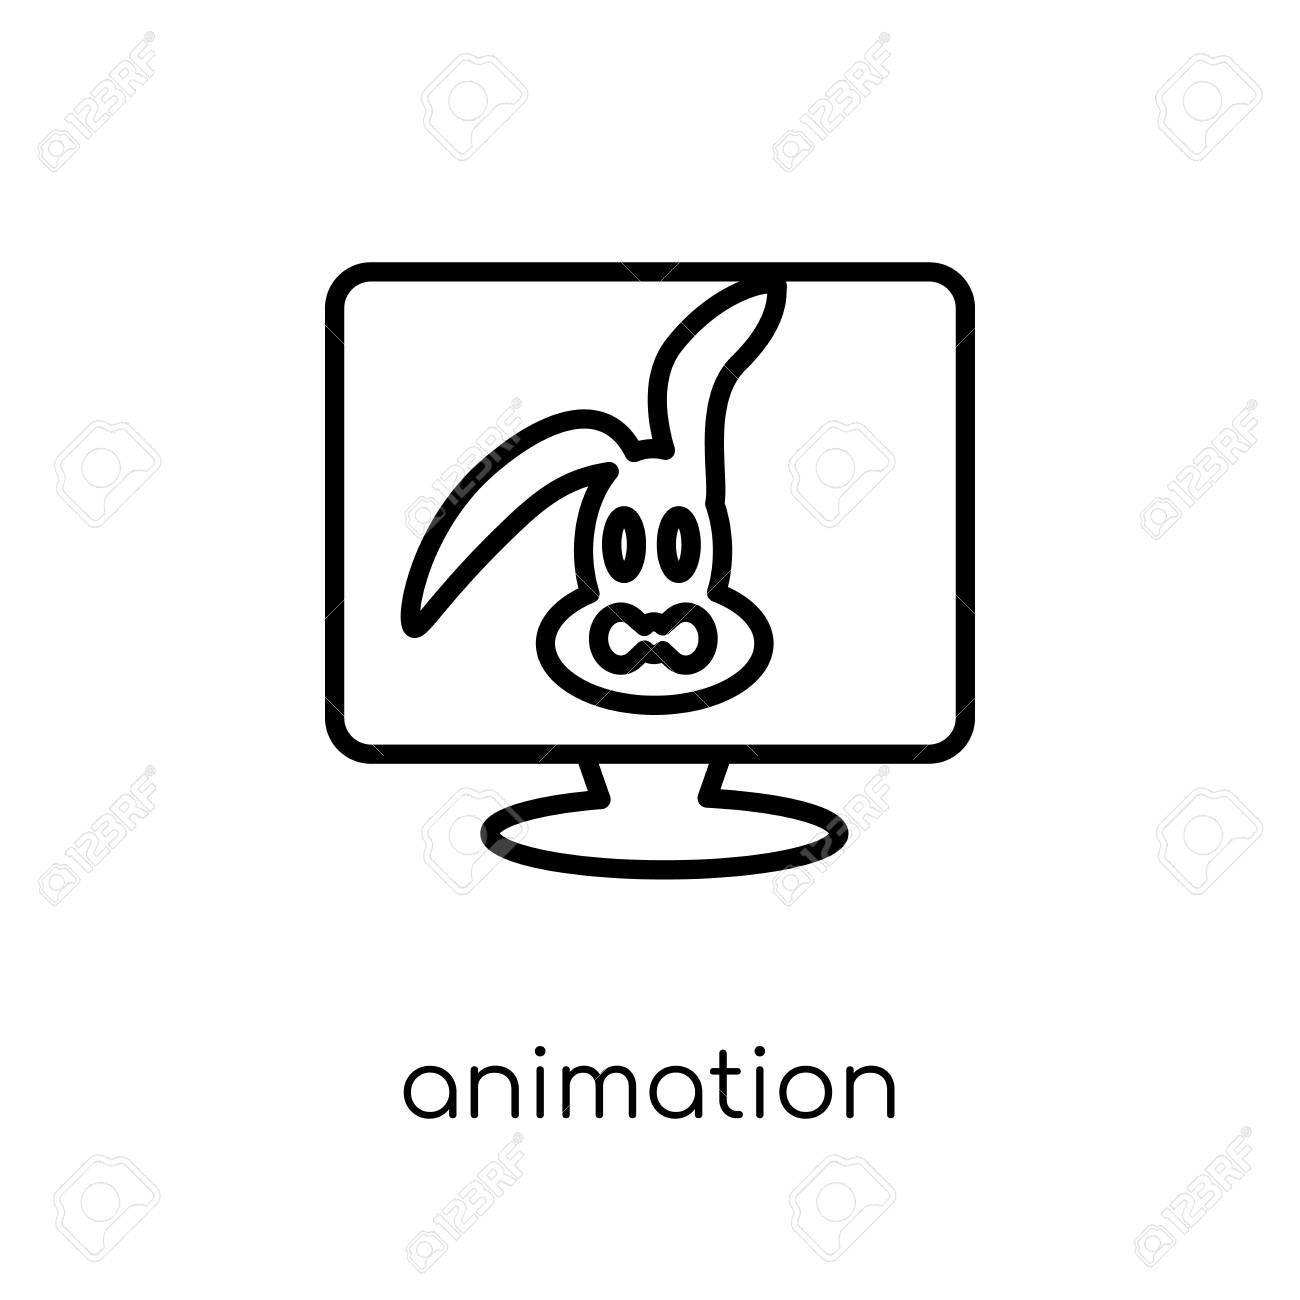 animation icon trendy modern